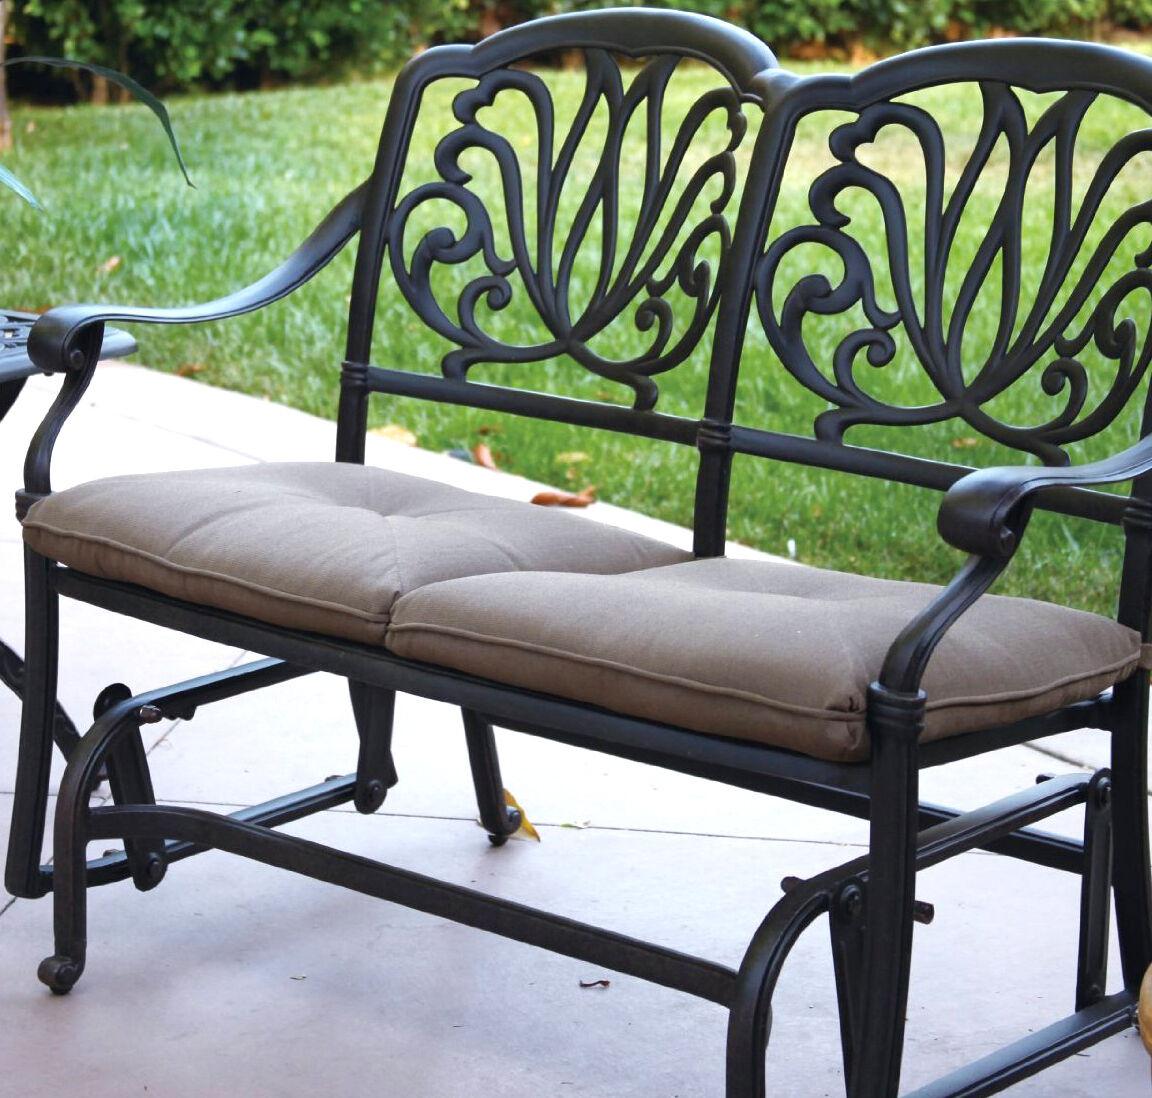 Outdoor Glider Elisabeth Patio Cast Aluminum Bench Furniture Black Desert Bronze Pertaining To Aluminum Outdoor Double Glider Benches (View 25 of 25)